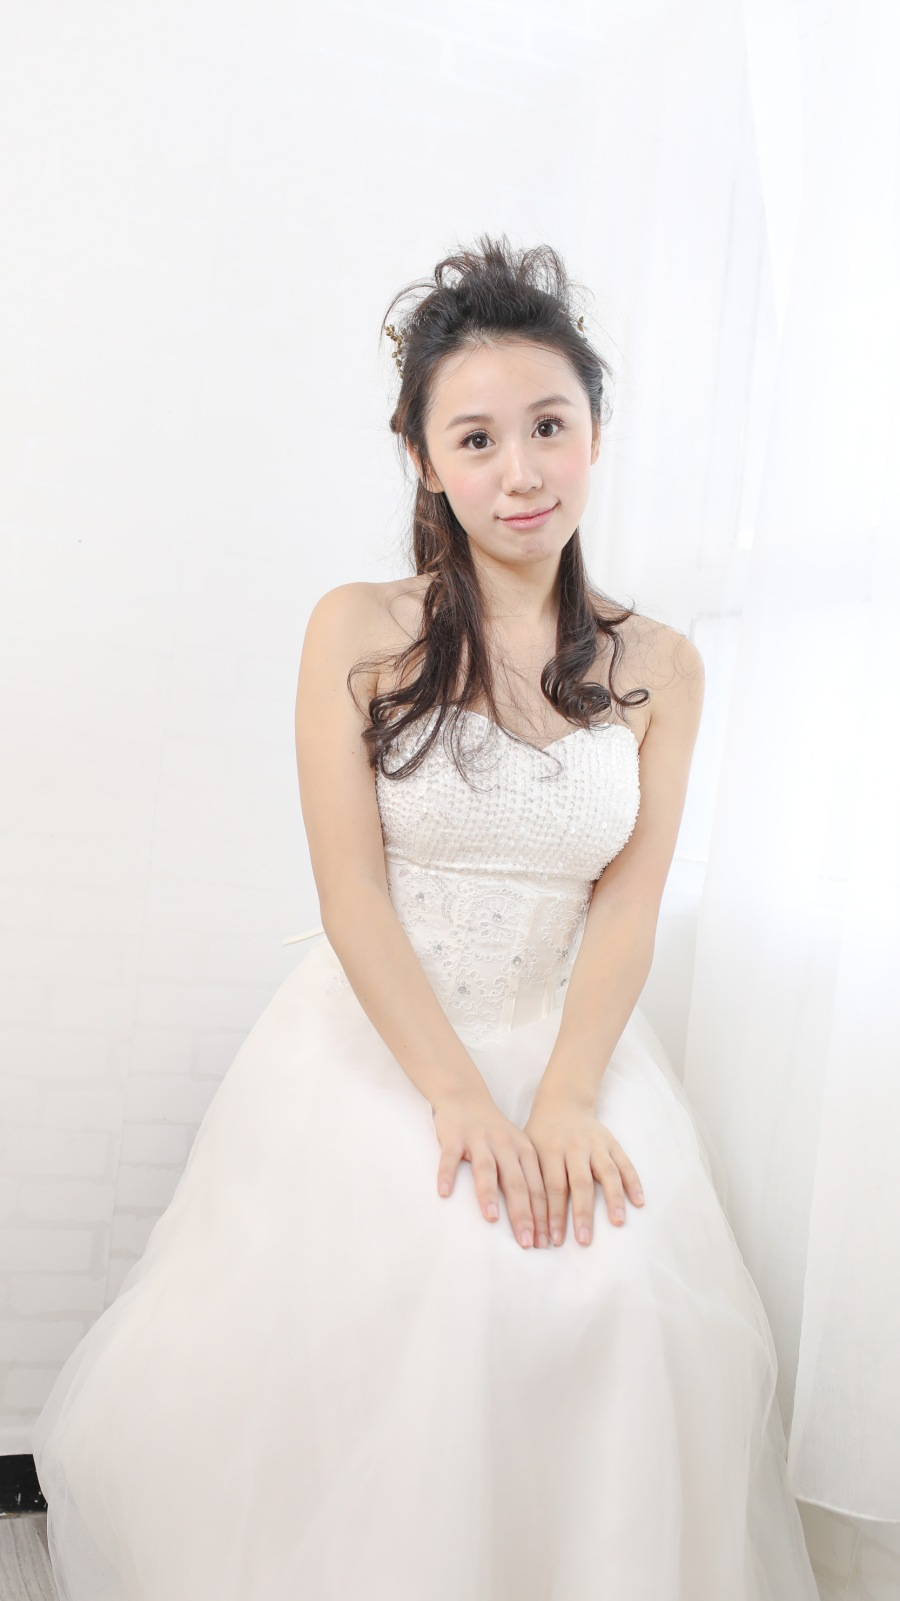 韓式新娘化妝髮型攝影_bridal_wedding_Korea_makeup_hairstyling_Top_MUA_paulstylist_photography_hk_stephanie-19